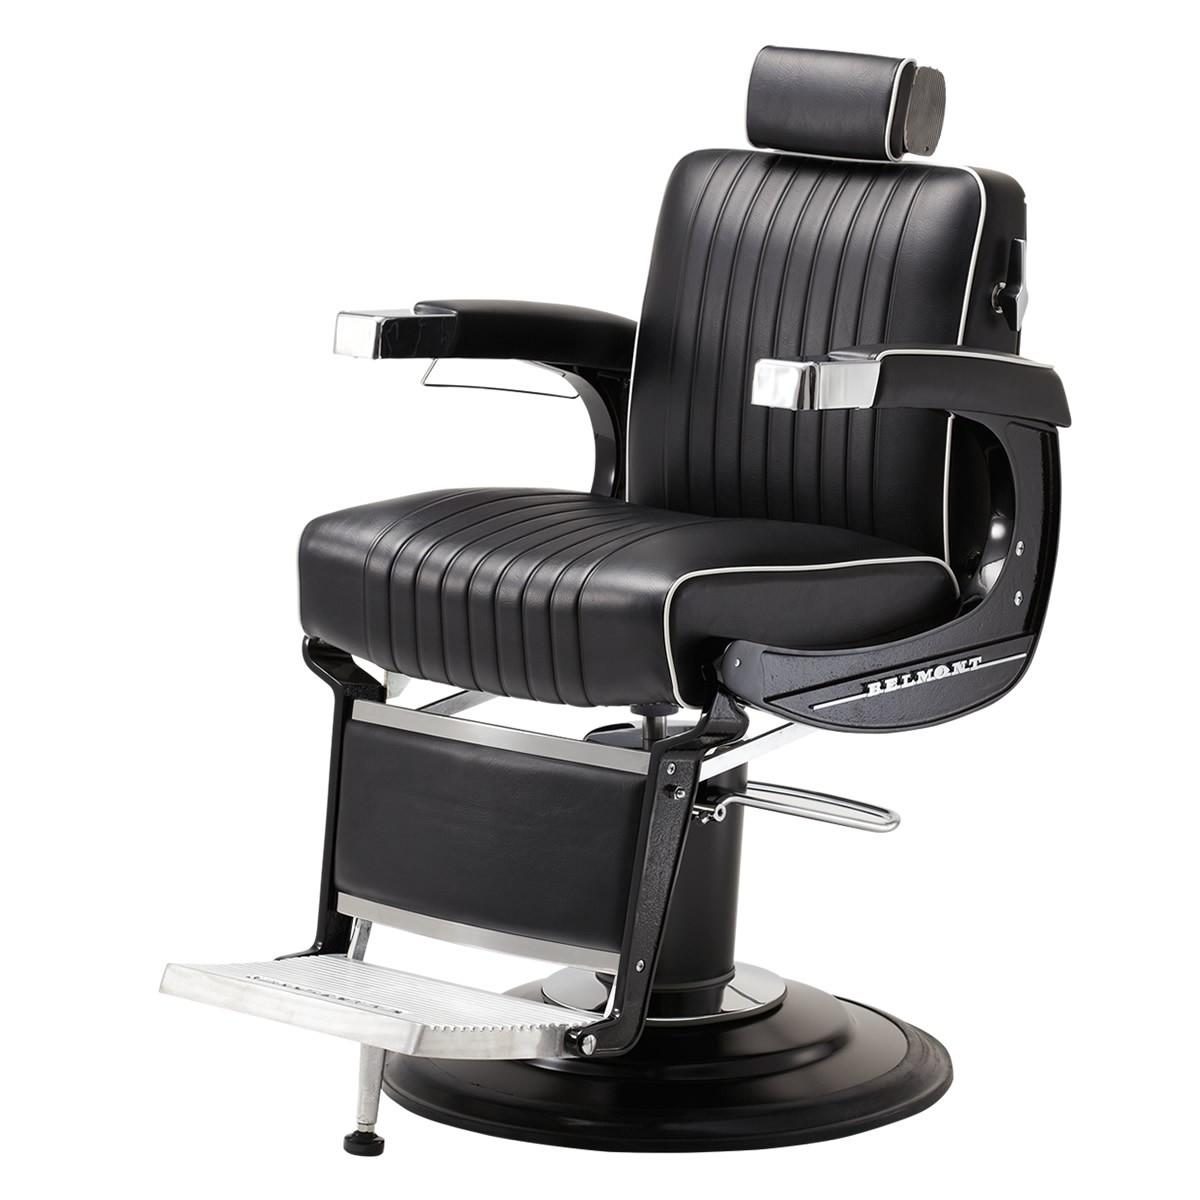 """ELITE BLACK"" Barber Chair by TAKARA BELMONT (Made in Japan)"